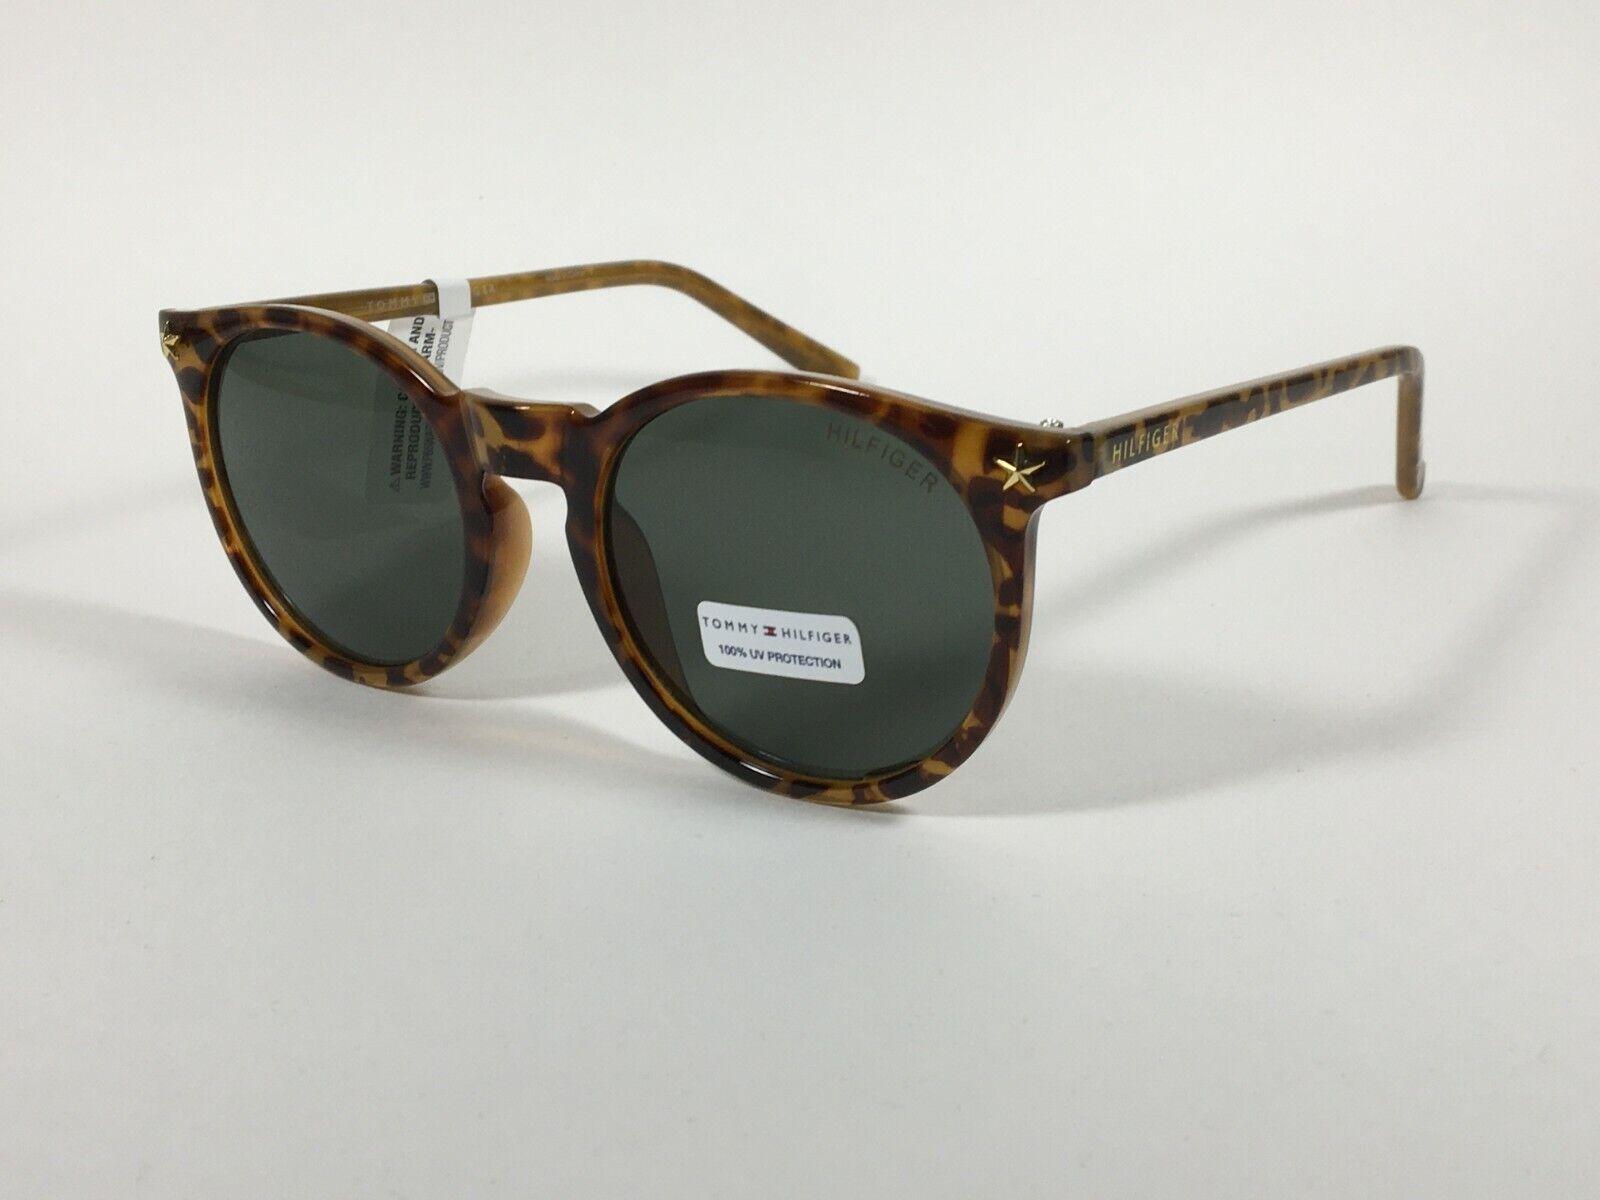 Authentic Tommy Hilfiger Biddy Round Keyhole Sunglasses Milk Tortoise Green Lens